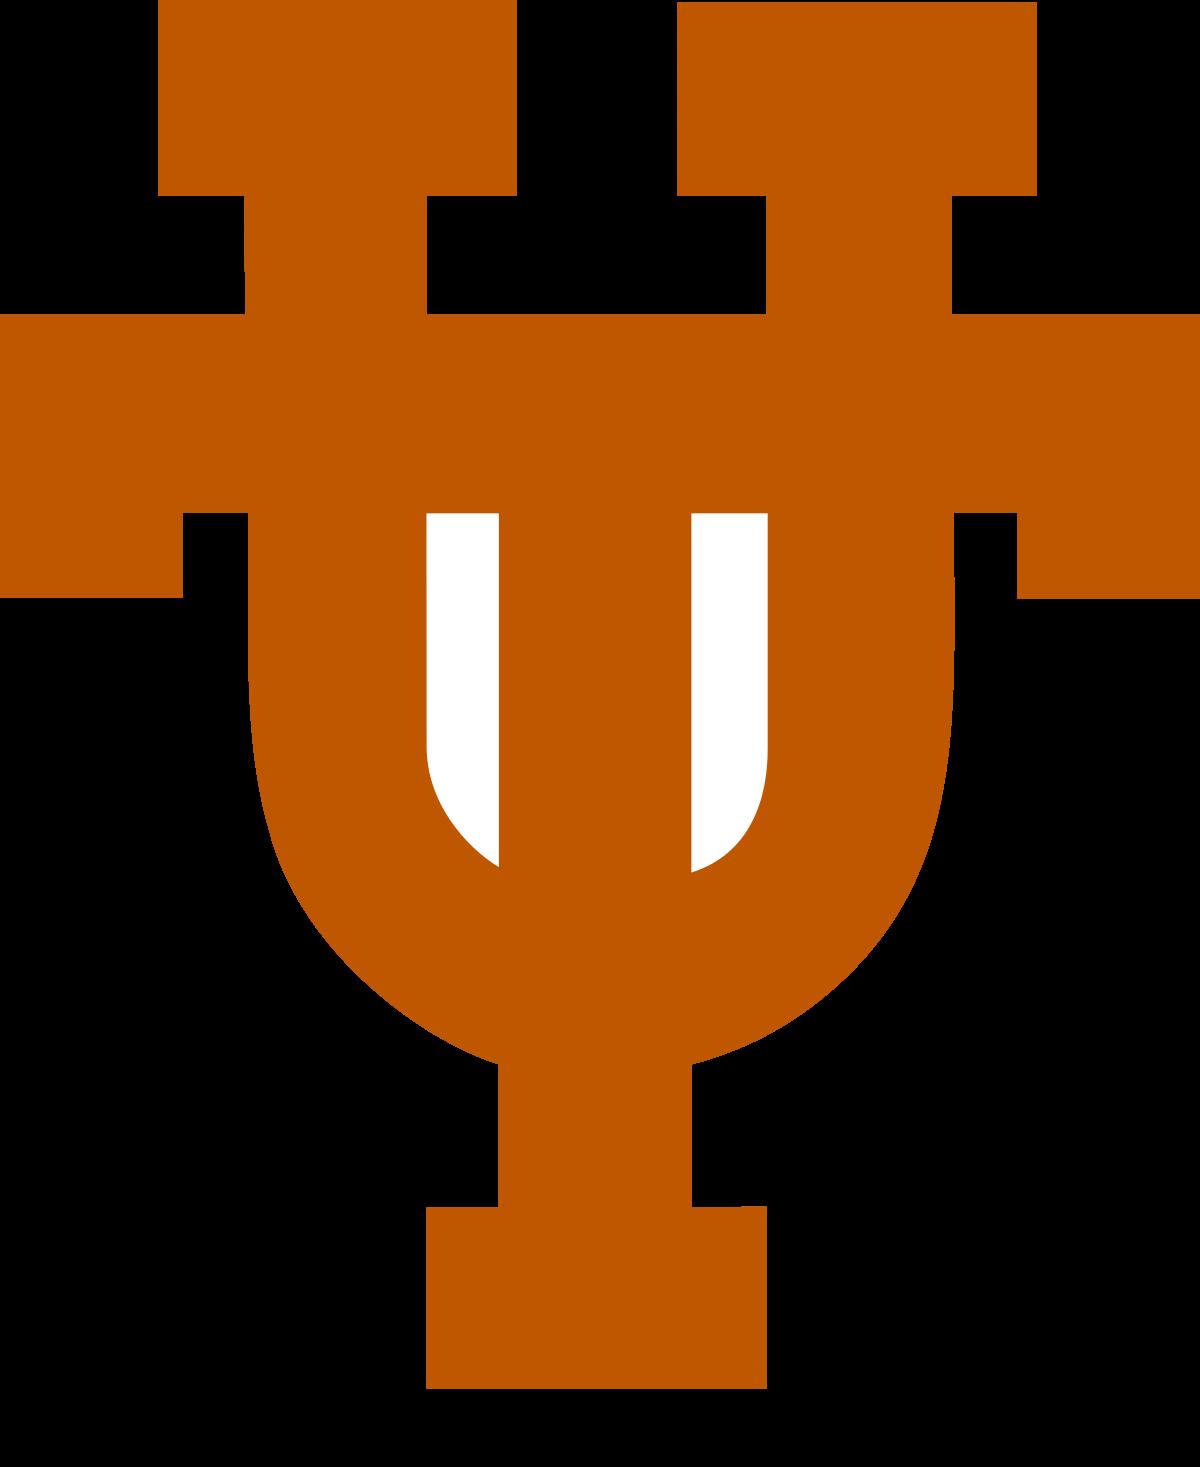 File:UT&T text logo.svg.